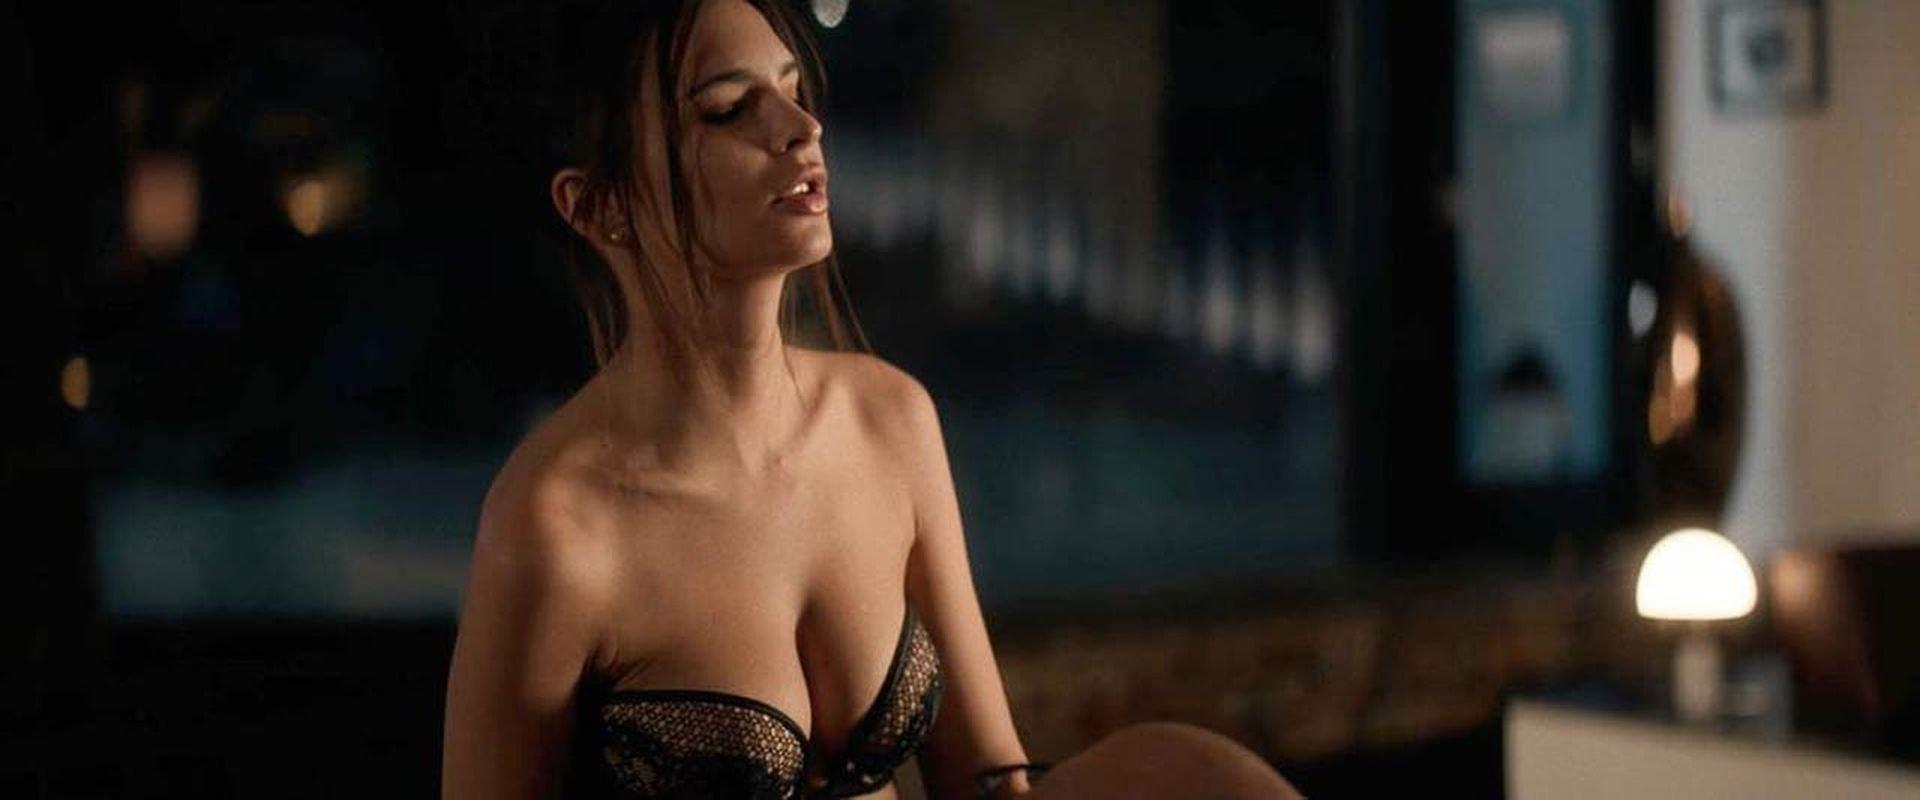 Emily ratajkowski hot video